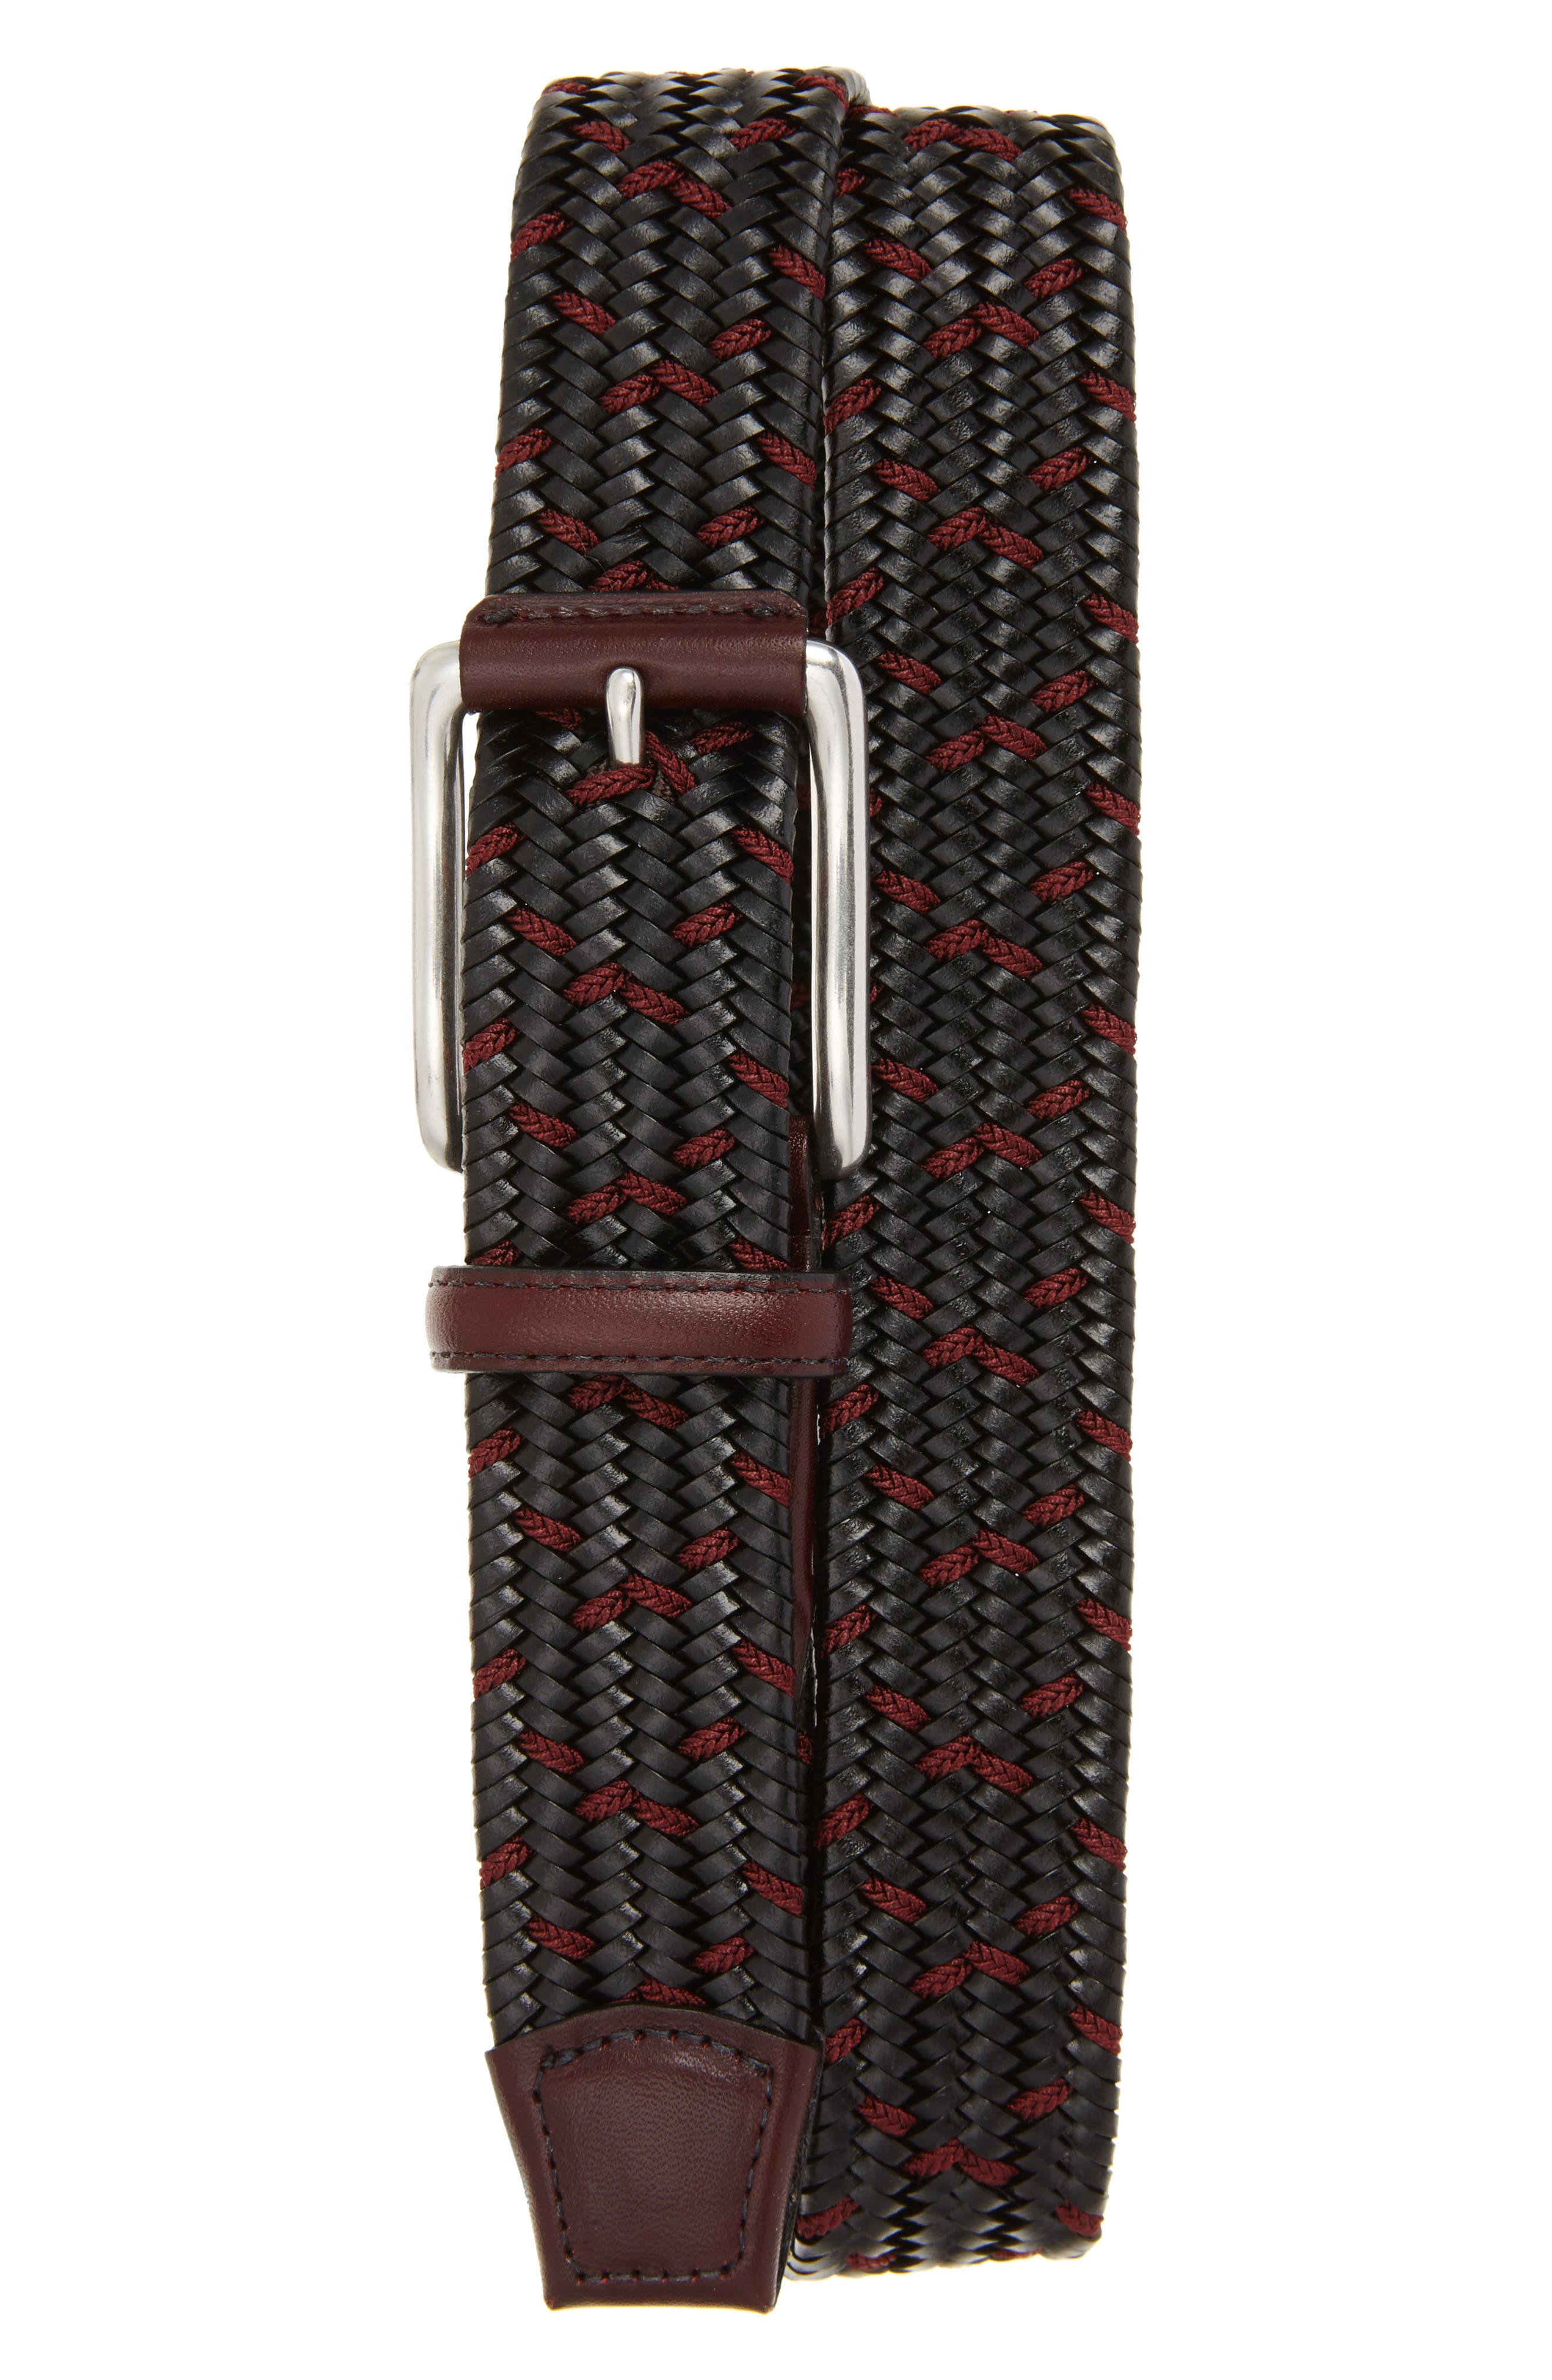 Torino Belts Woven Mixed Media Belt, Black/ Burgundy